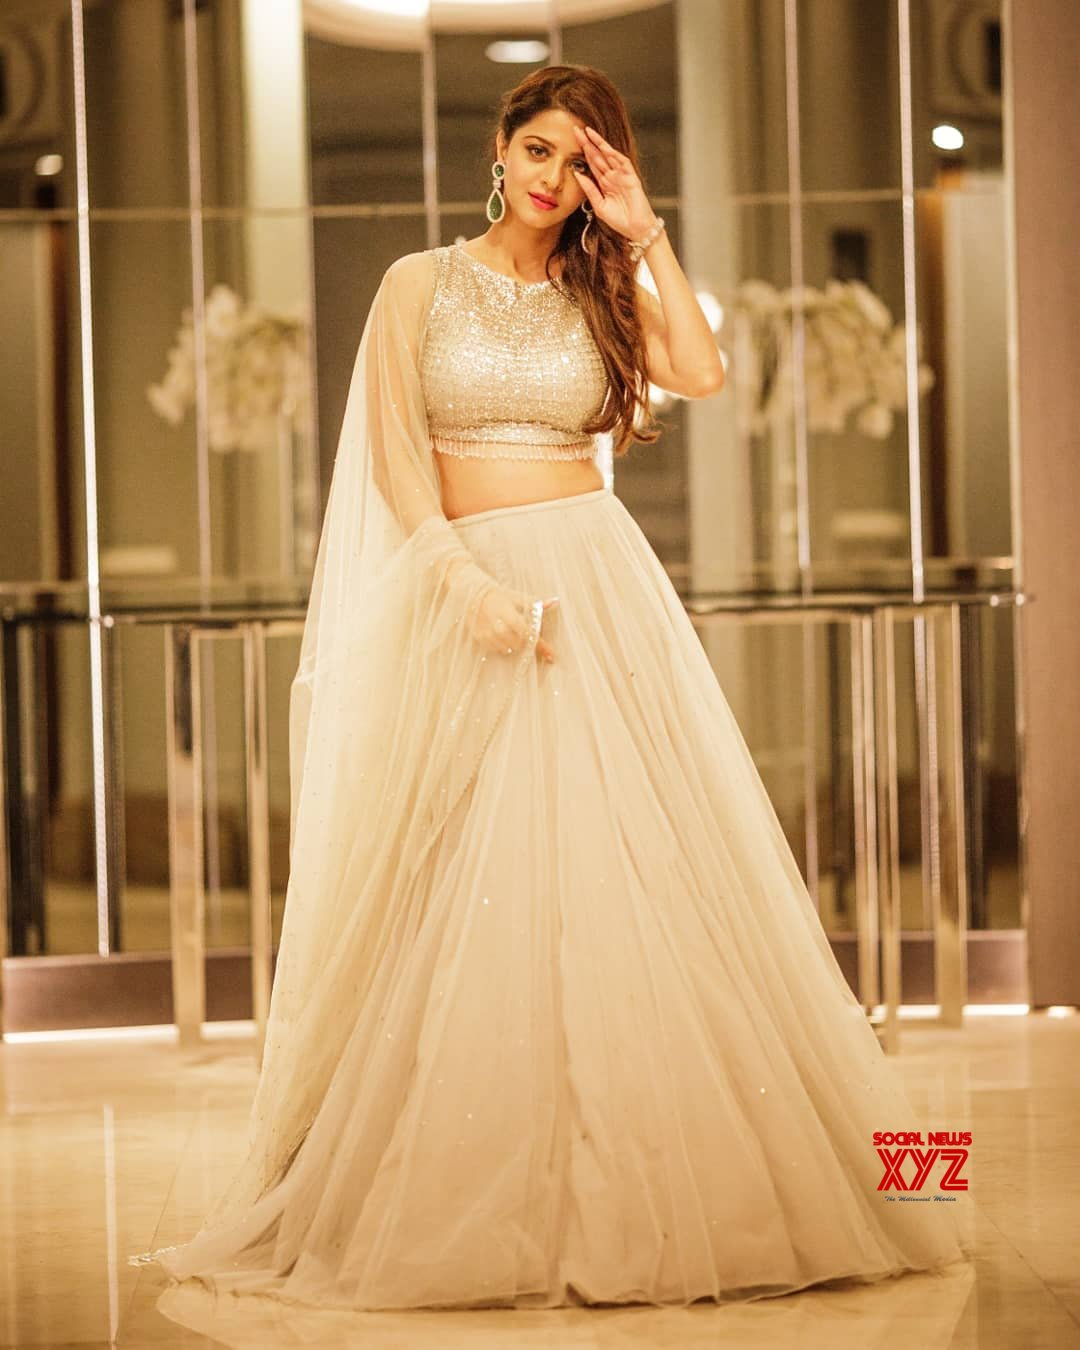 Actress Vedhika Super Elegant Stills From Kuala Lumpur